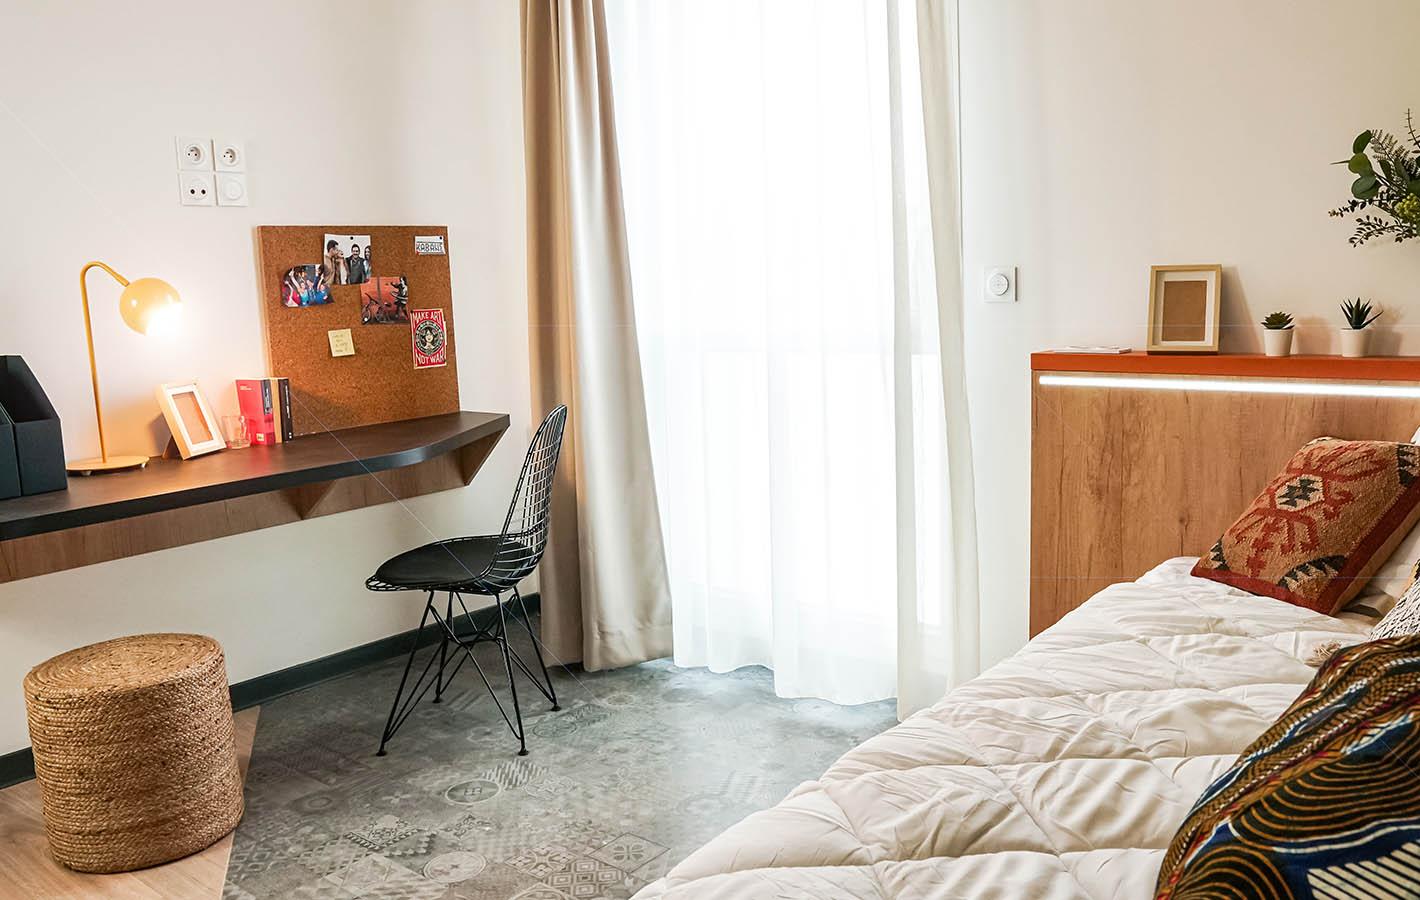 image  2021 01 28 residence etudiante suitetudes kabane montpellier studio 1 compr